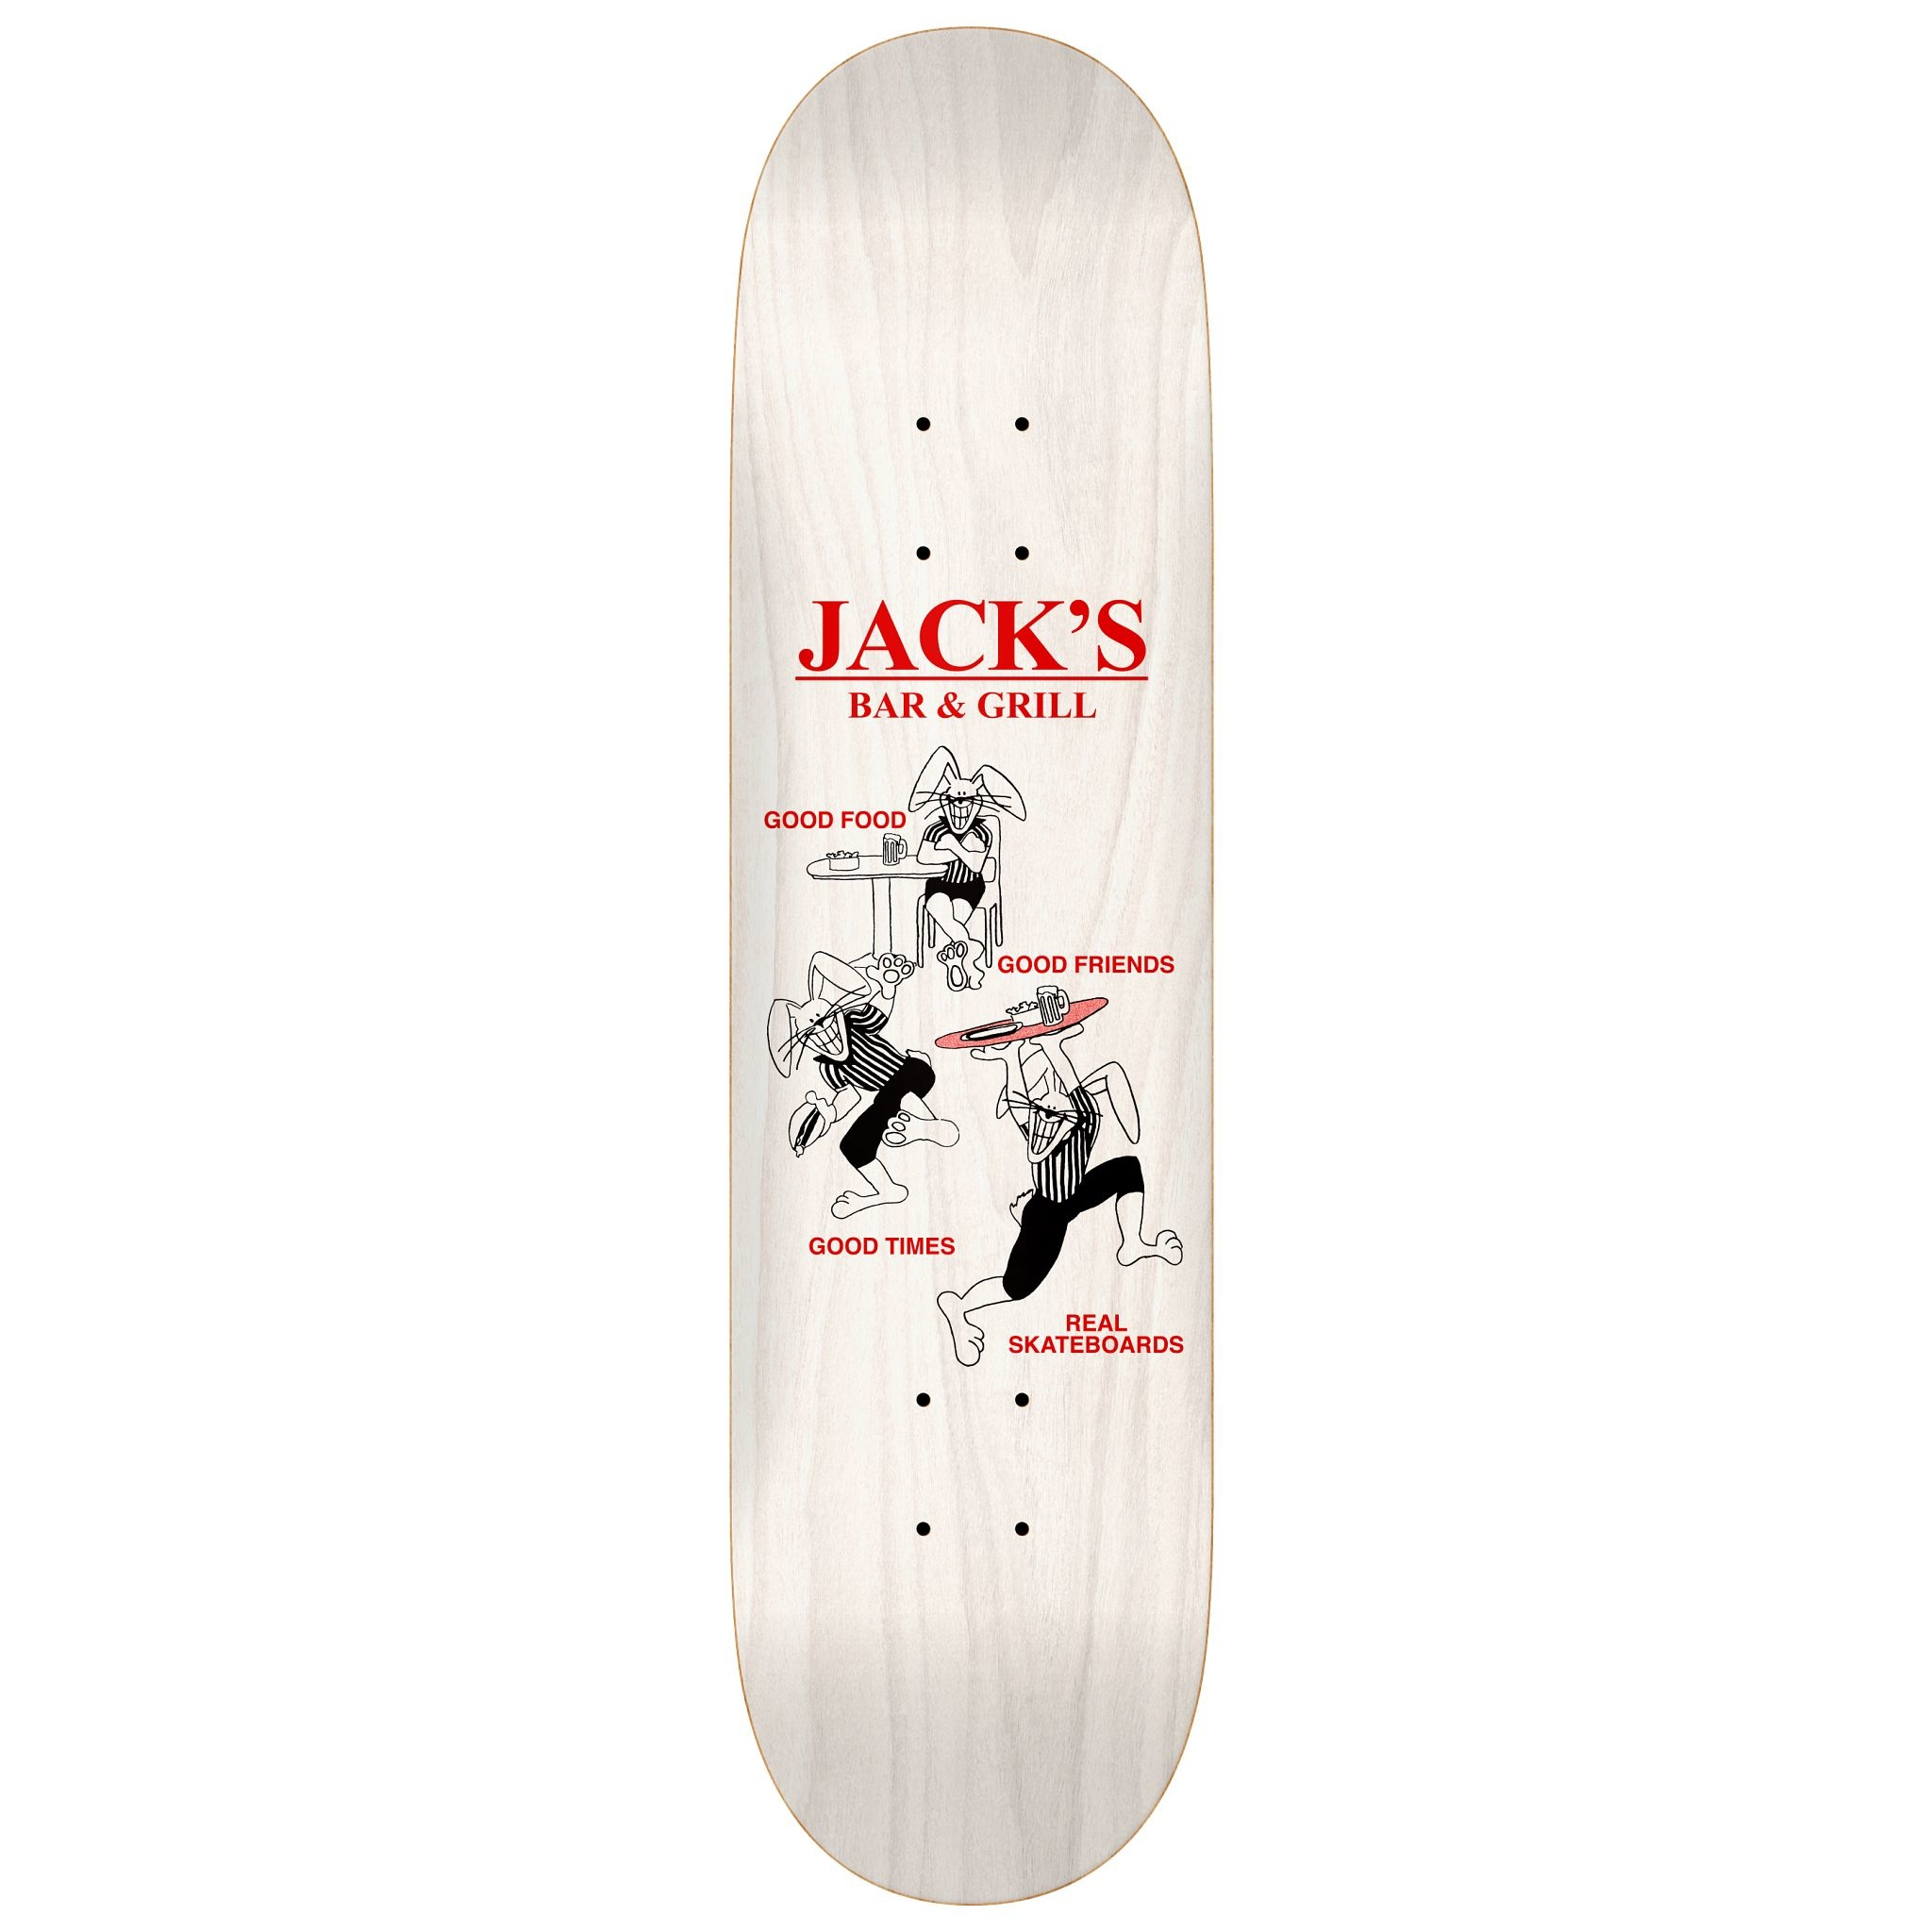 REAL REAL JACK GOODTIMES 8.38